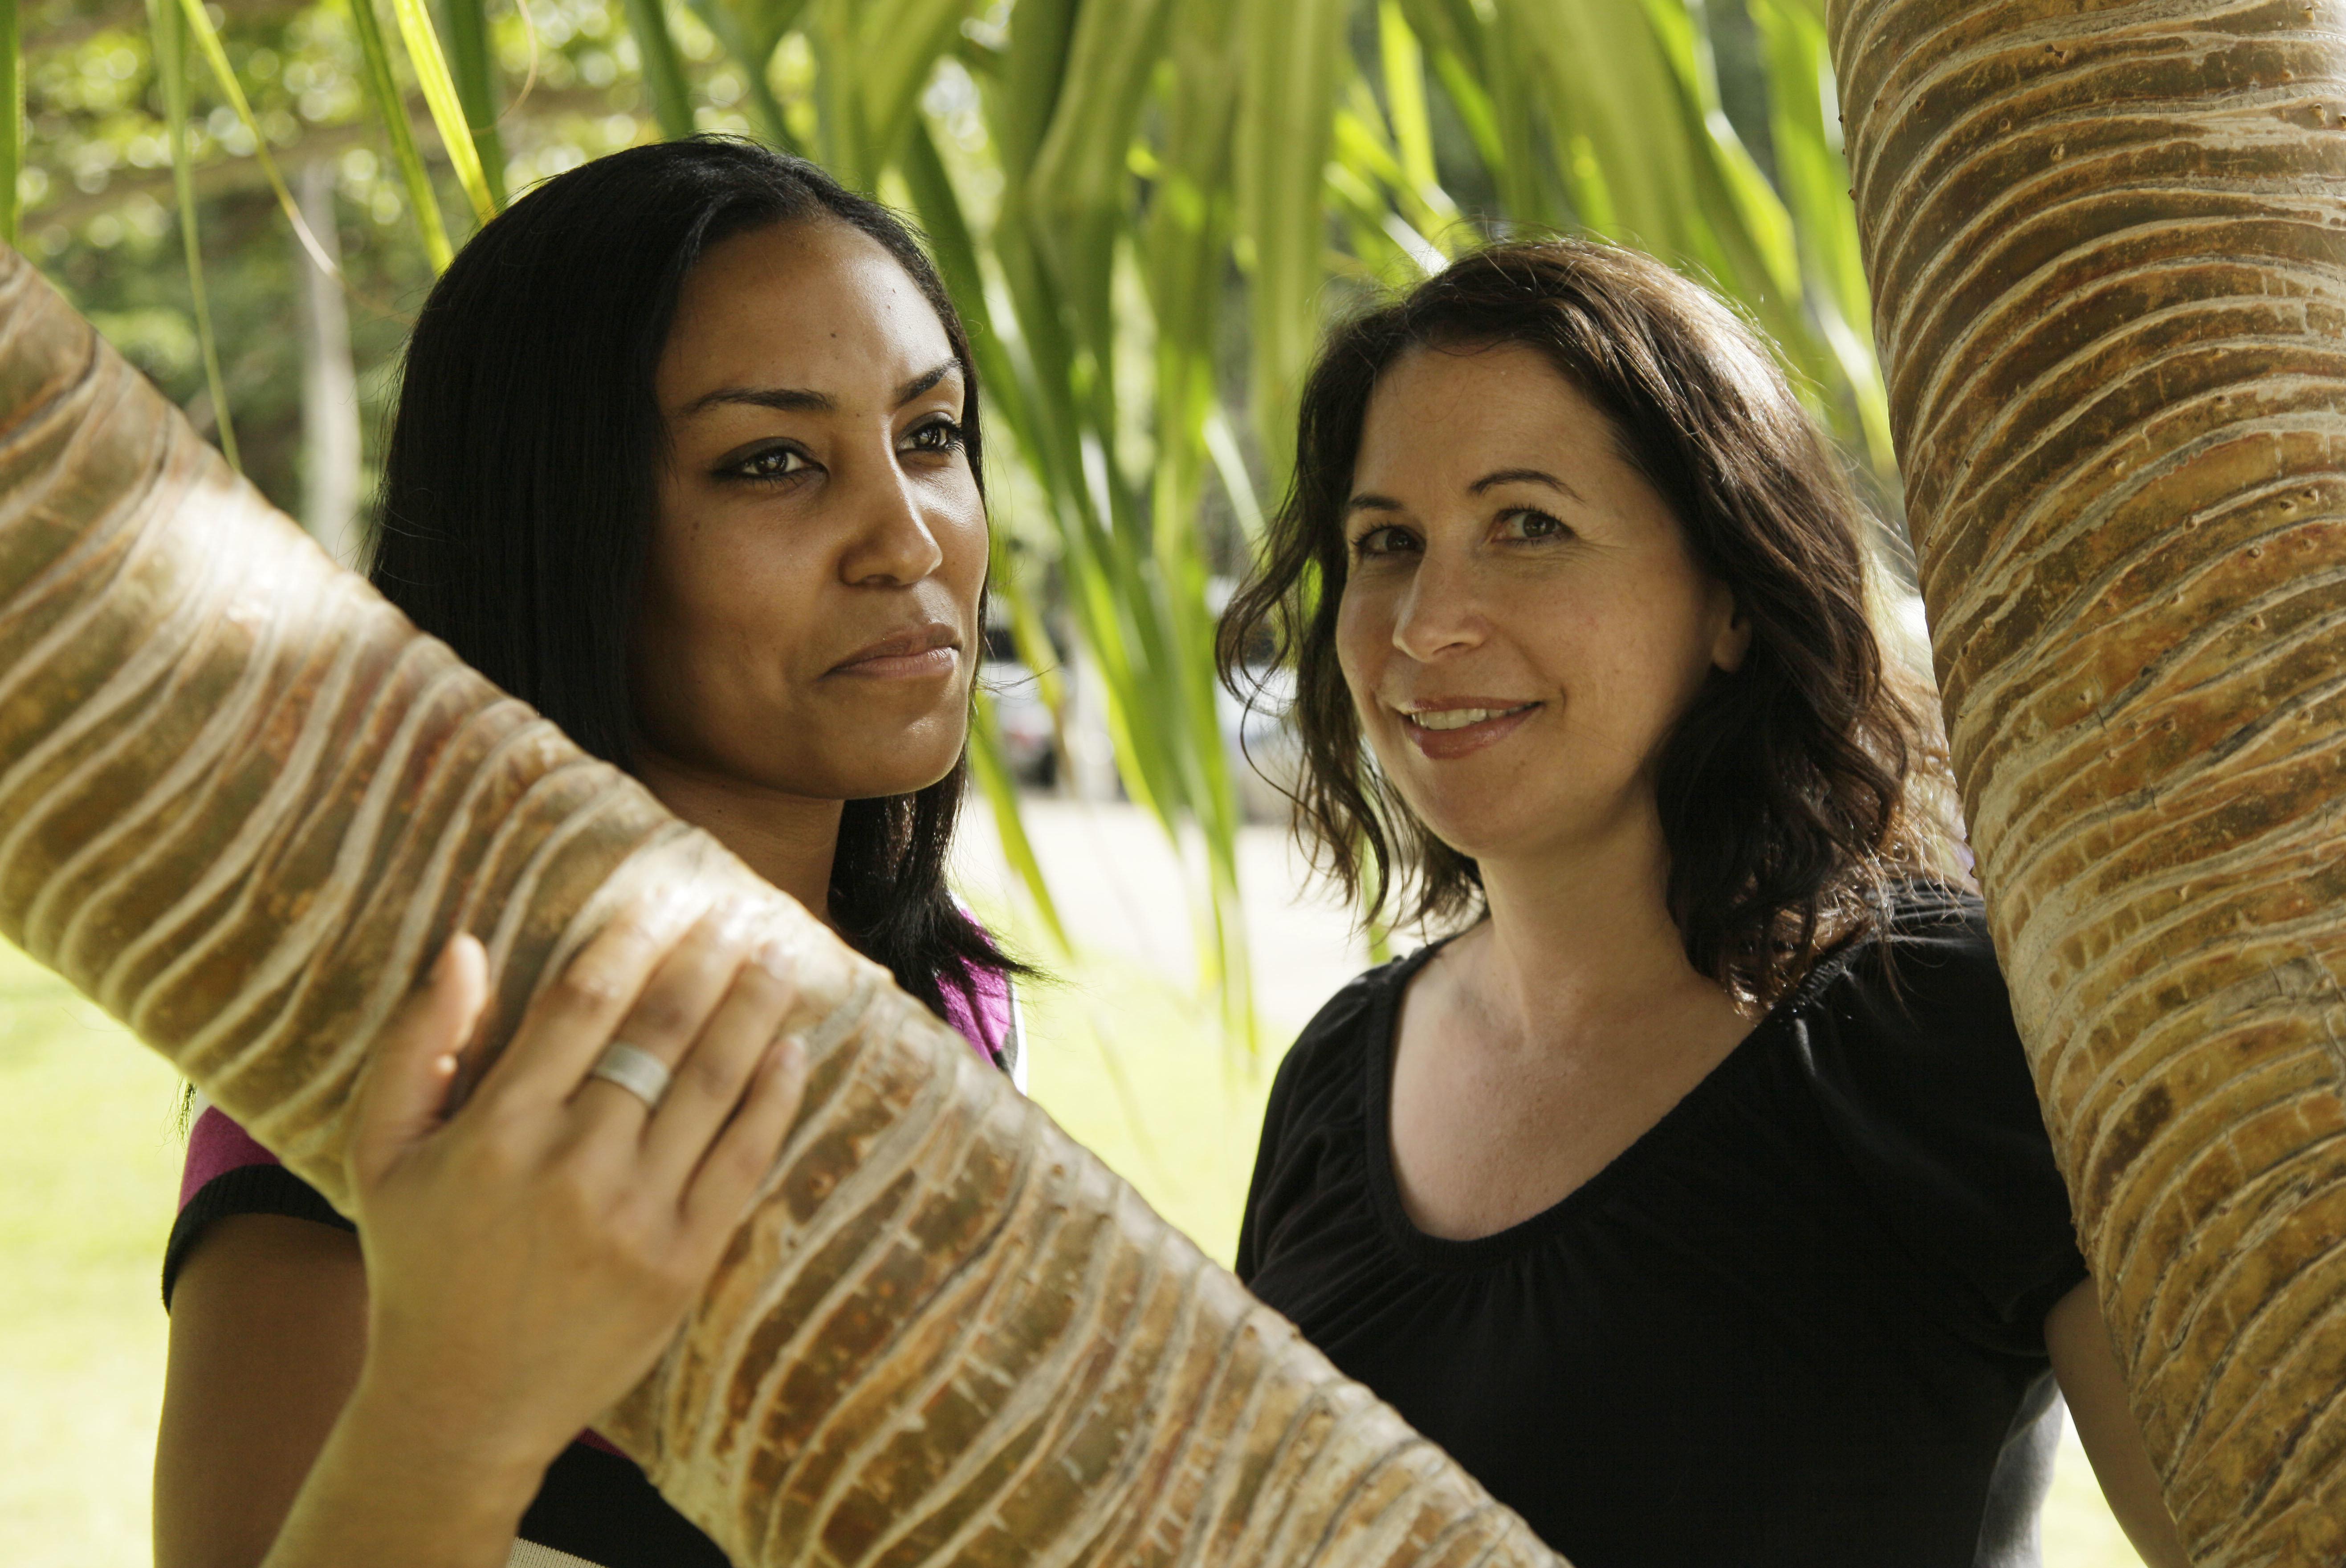 Taeko Bufford, left, and Diane Cervelli were turned away byHonolulu's Aloha Bed & Breakfast in 2007.